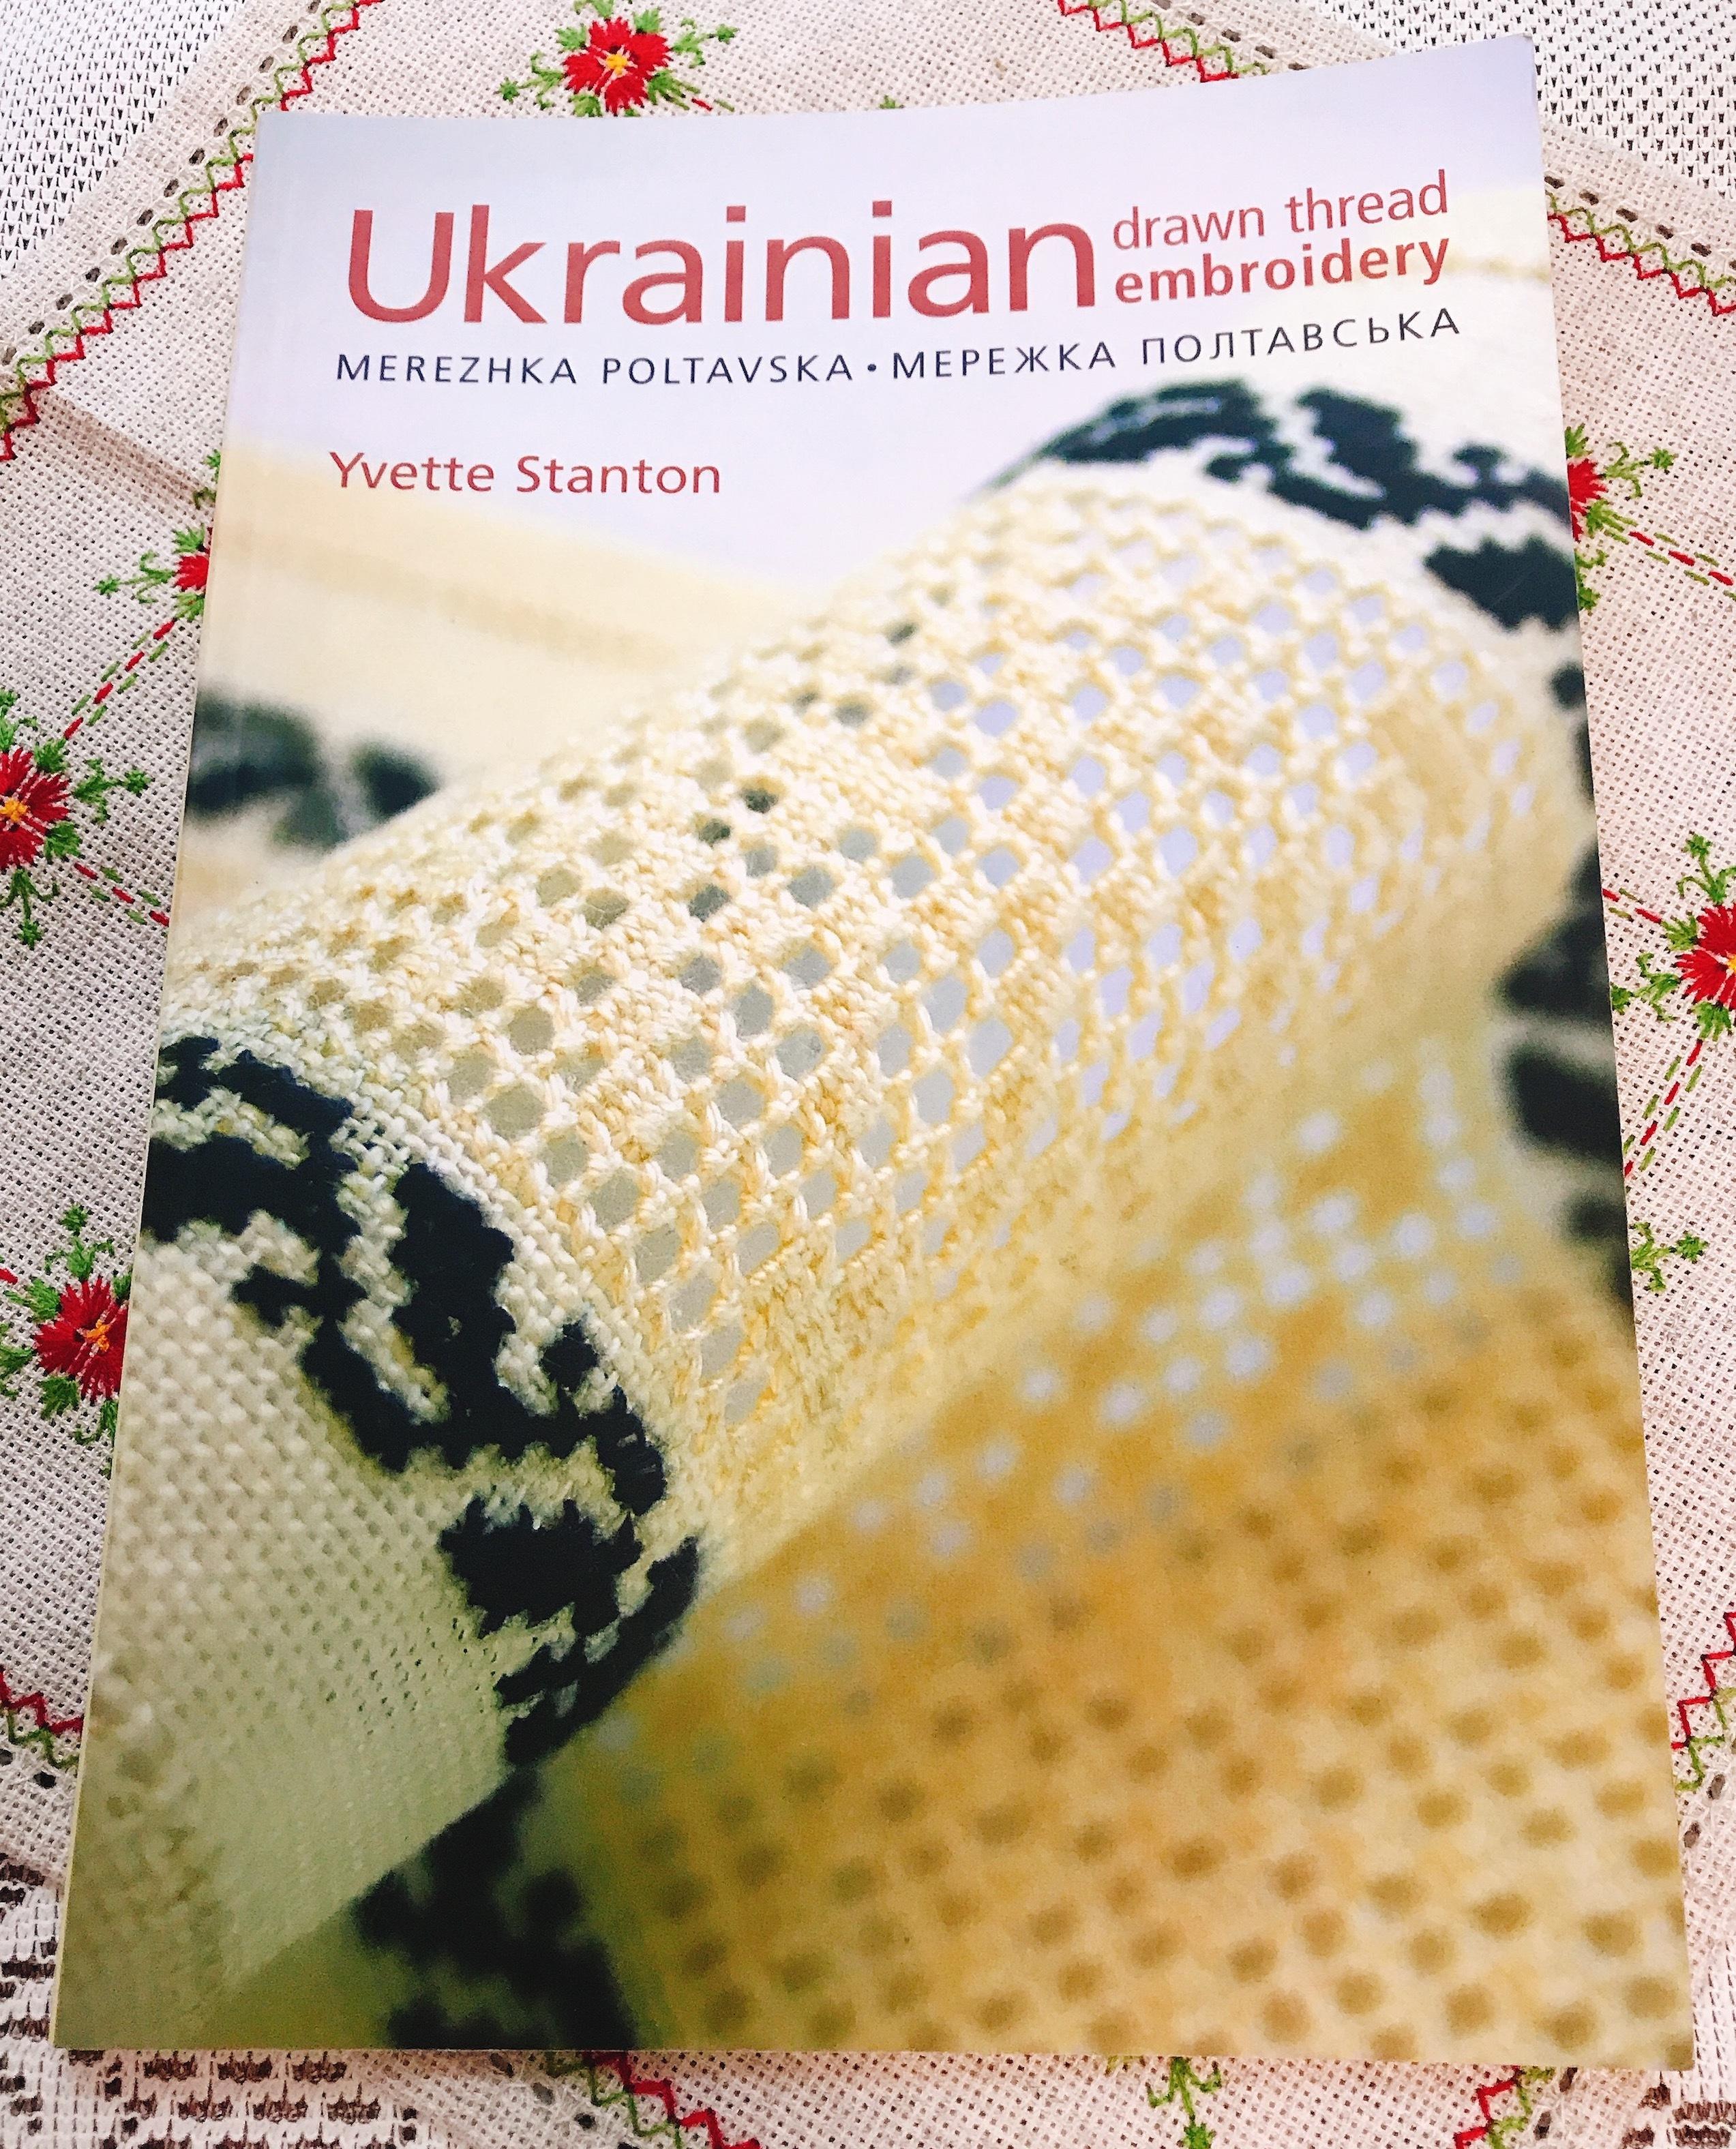 Ukrainian drawn thread embroidery